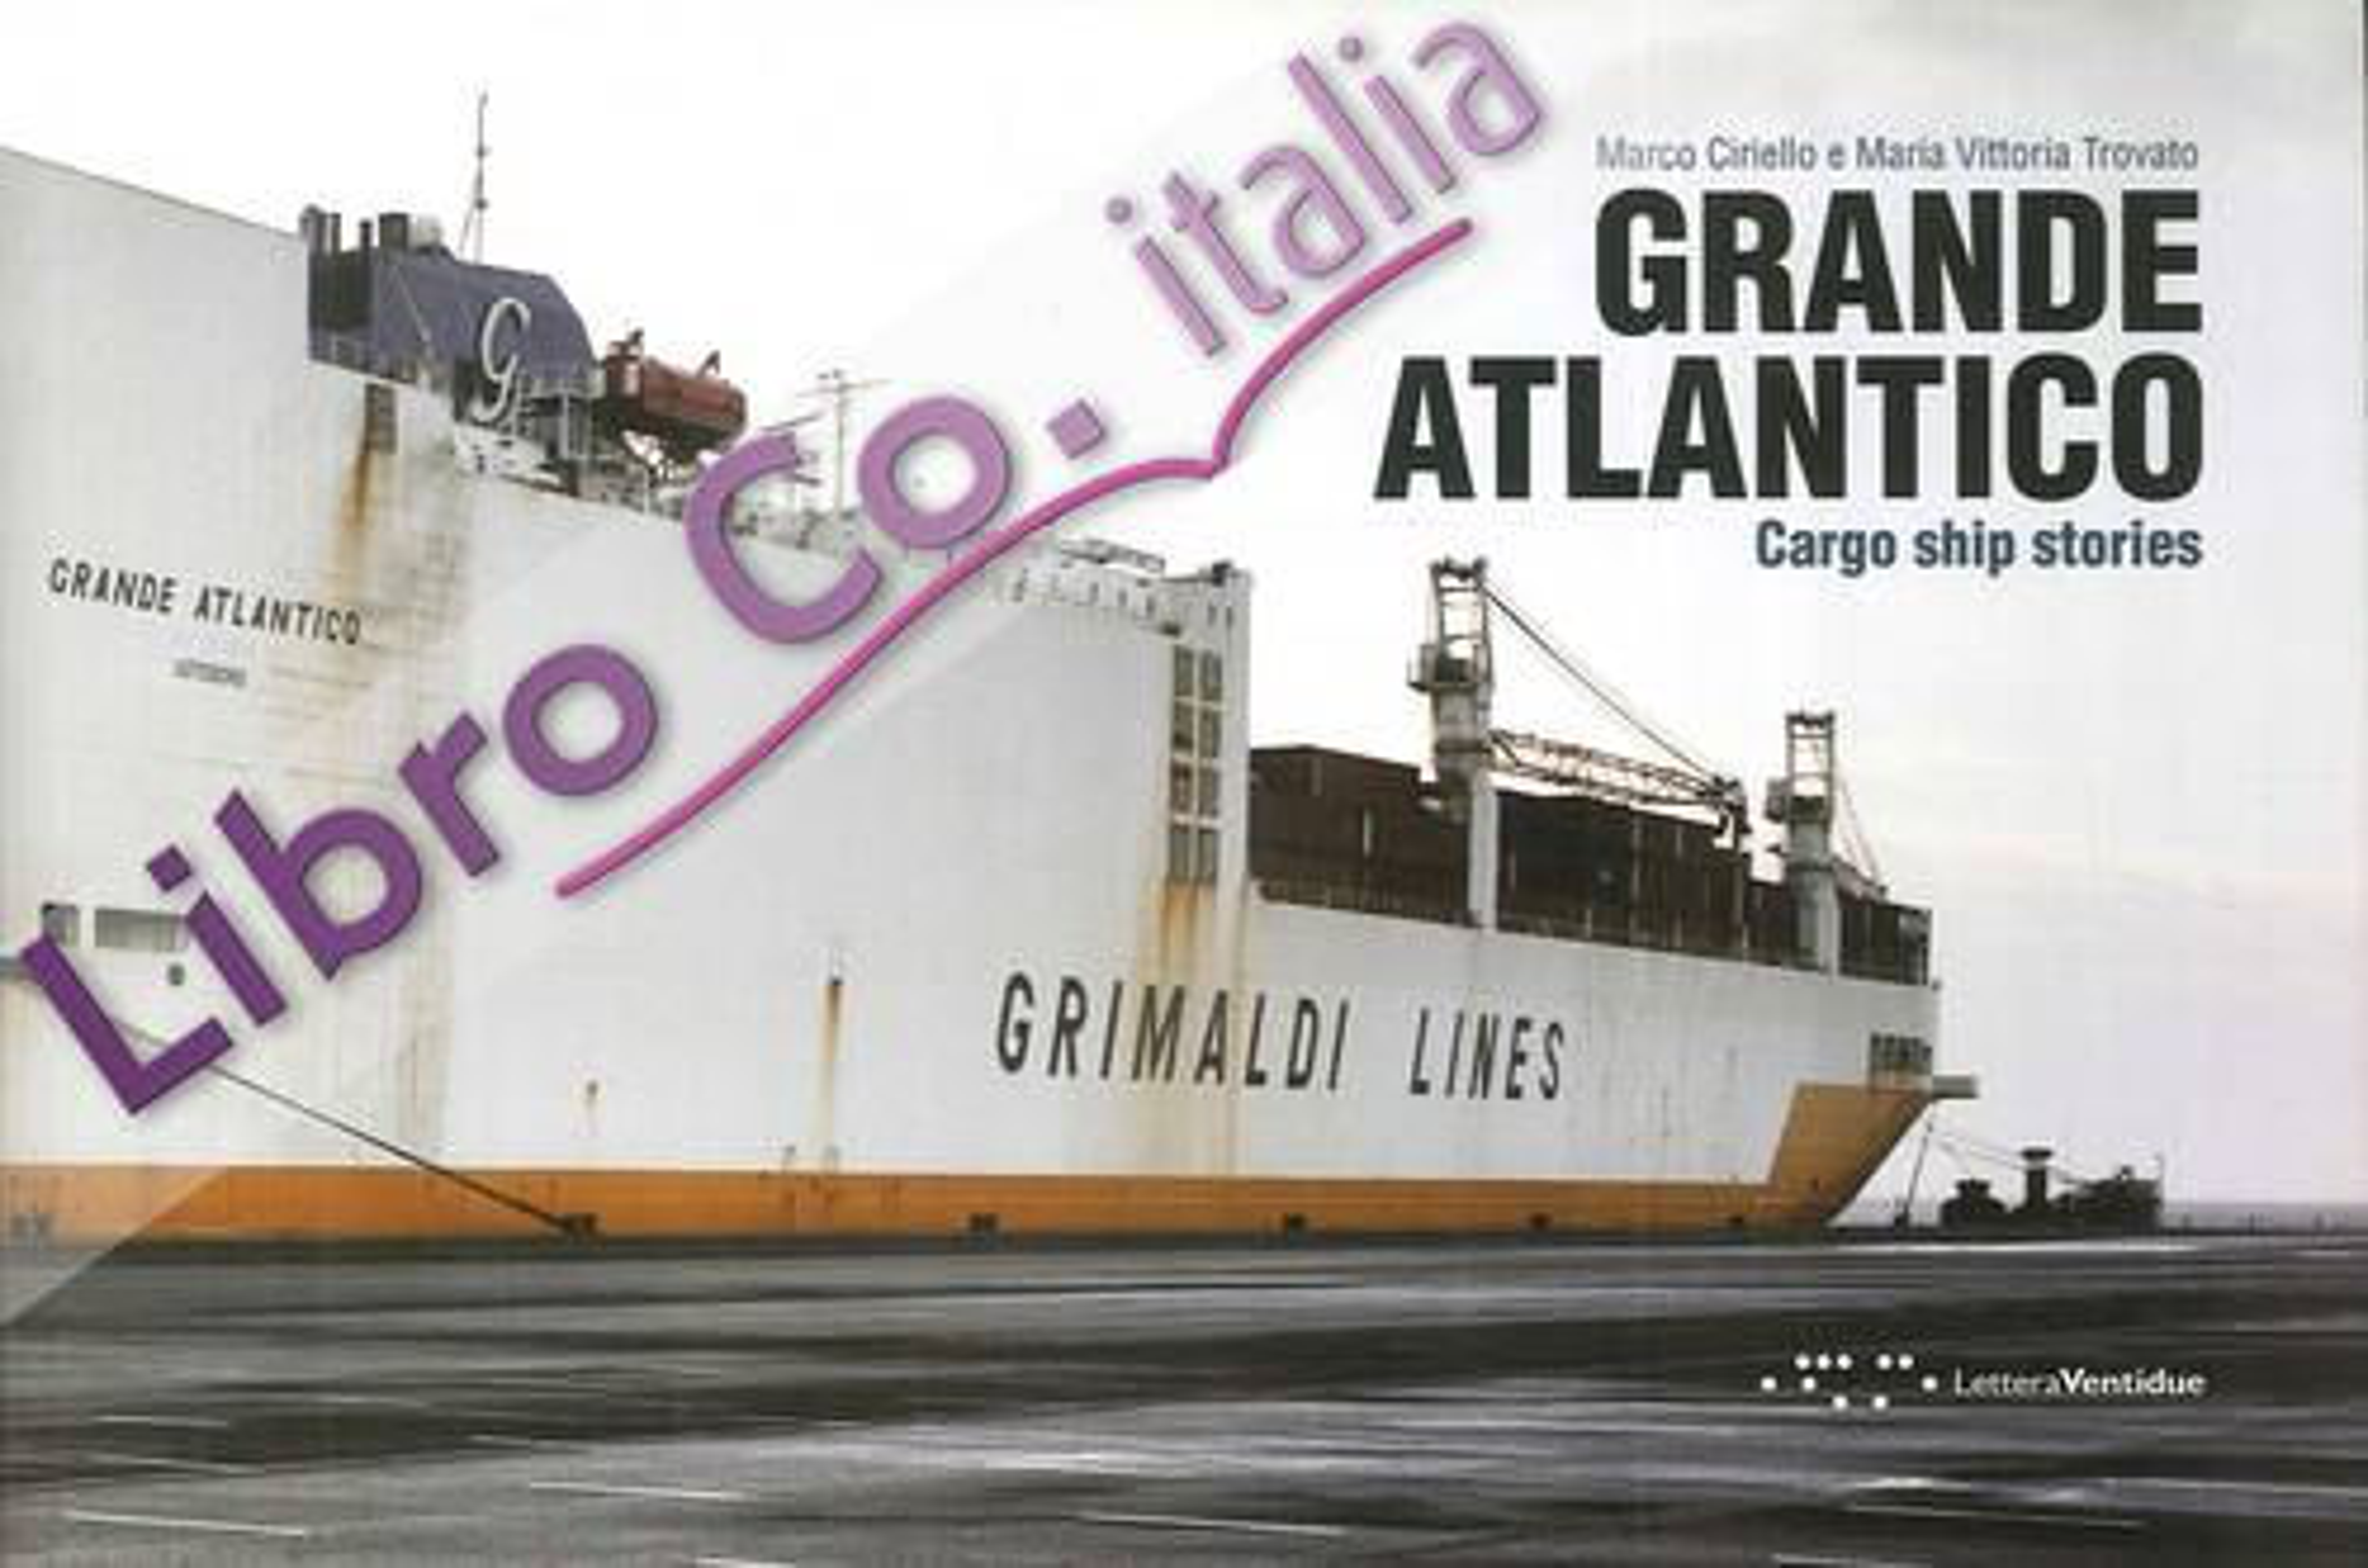 Grande Atlantico, cargo ship stories